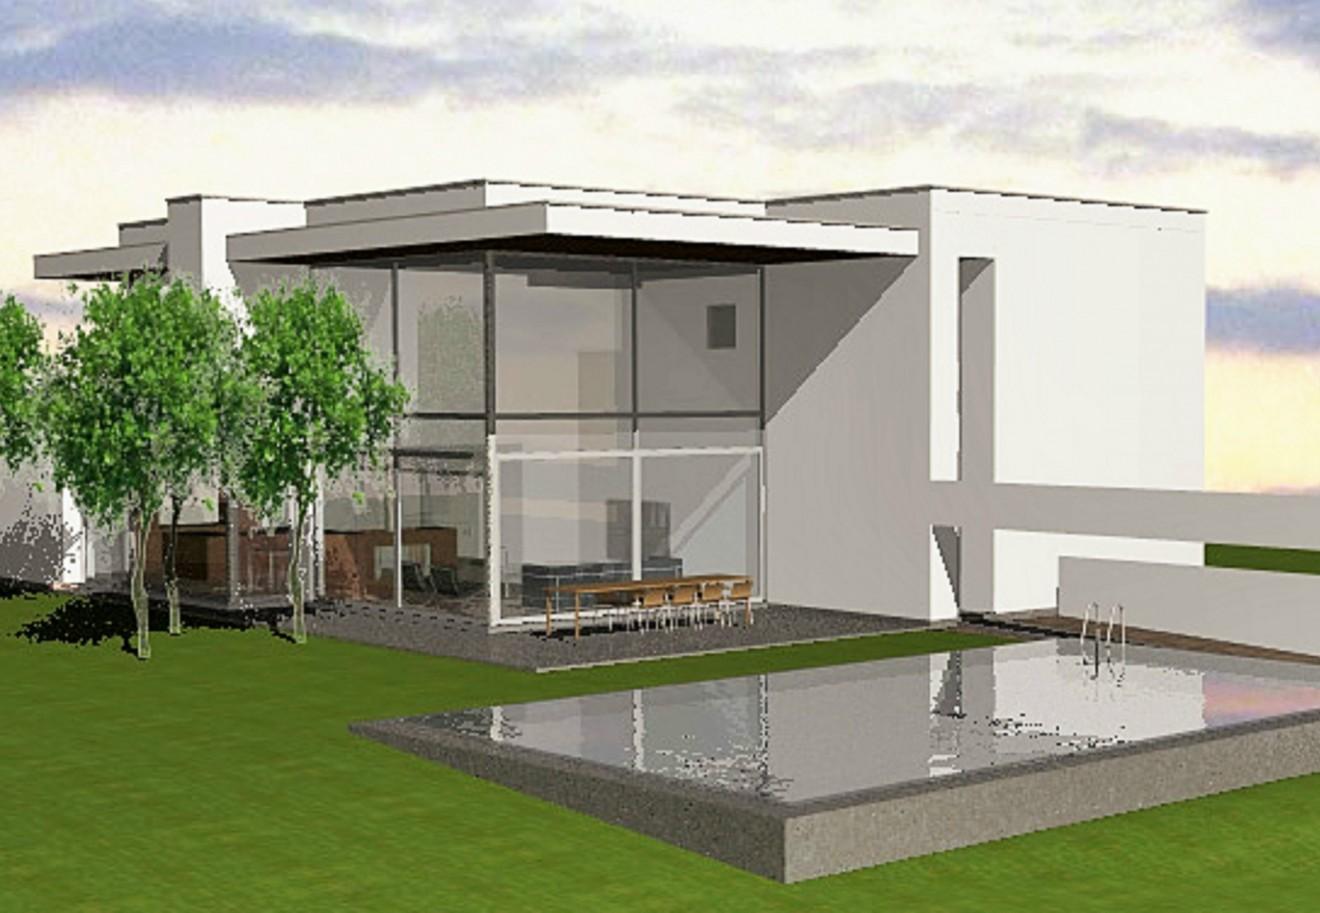 Architect- en ingenieursbureau Andries & Vuylsteke - Nieuwbouwwoning Zuid-afrika